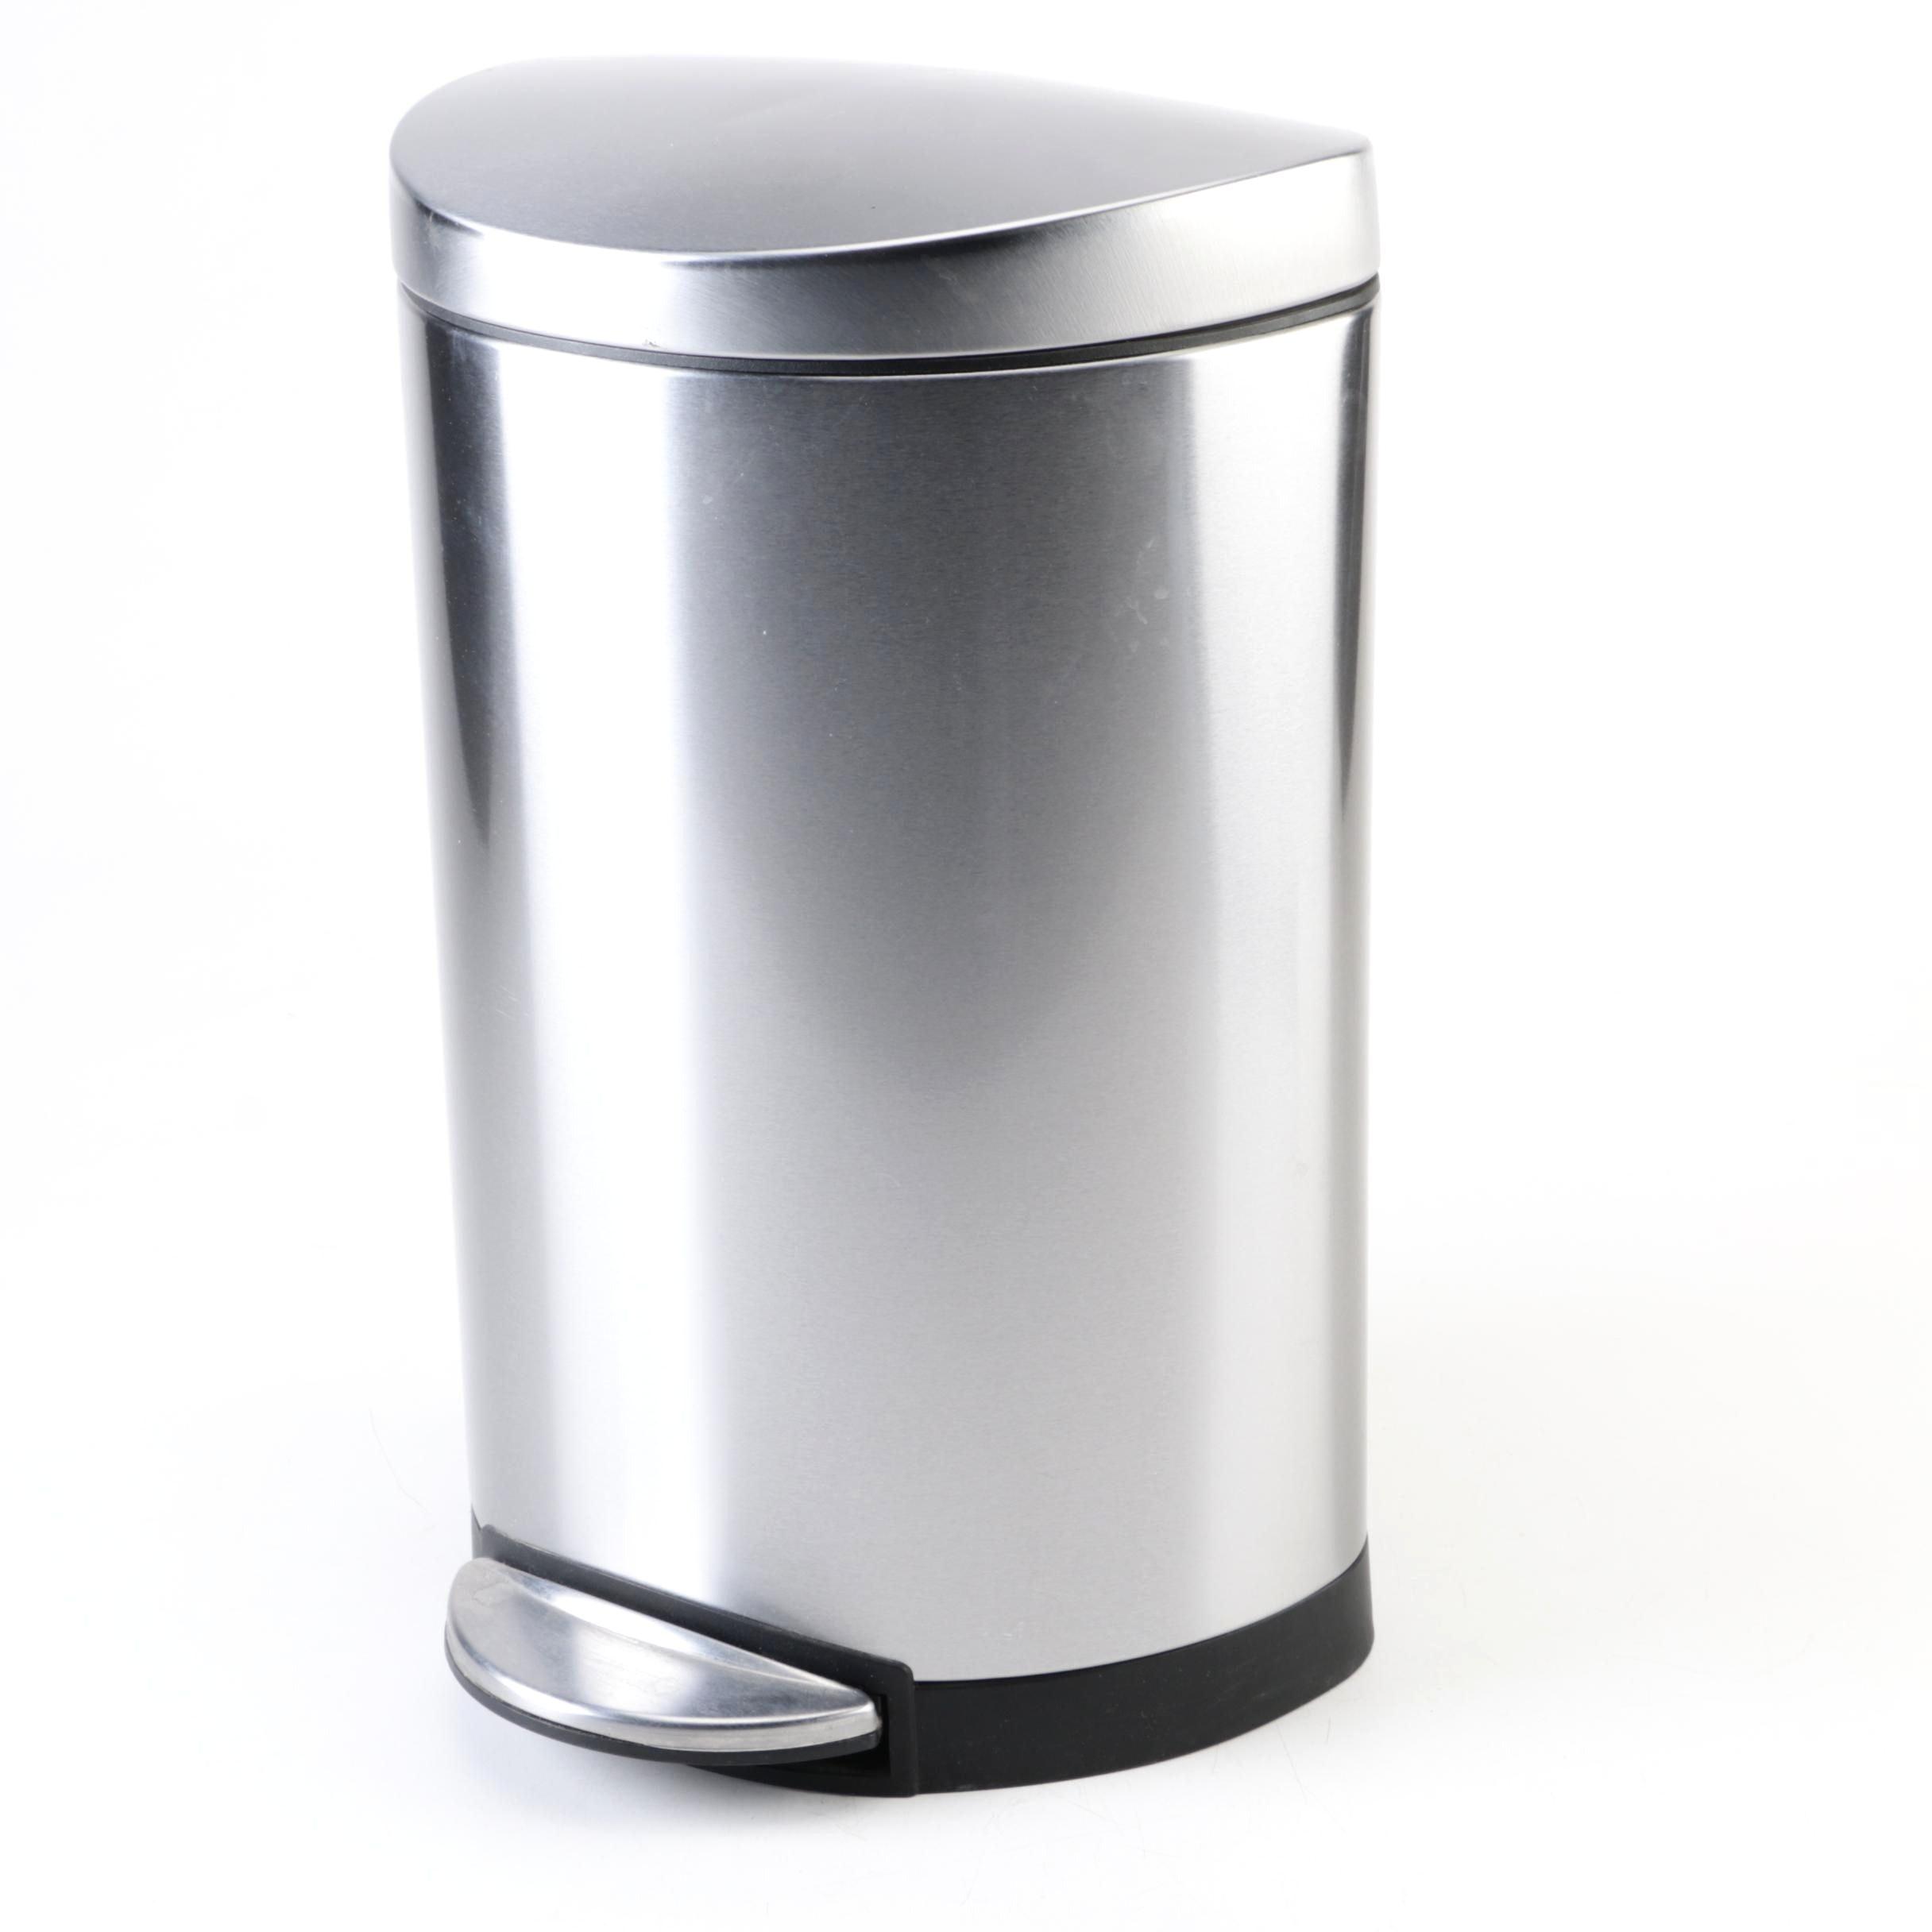 Simplehuman Stainless Steel Waste Bin